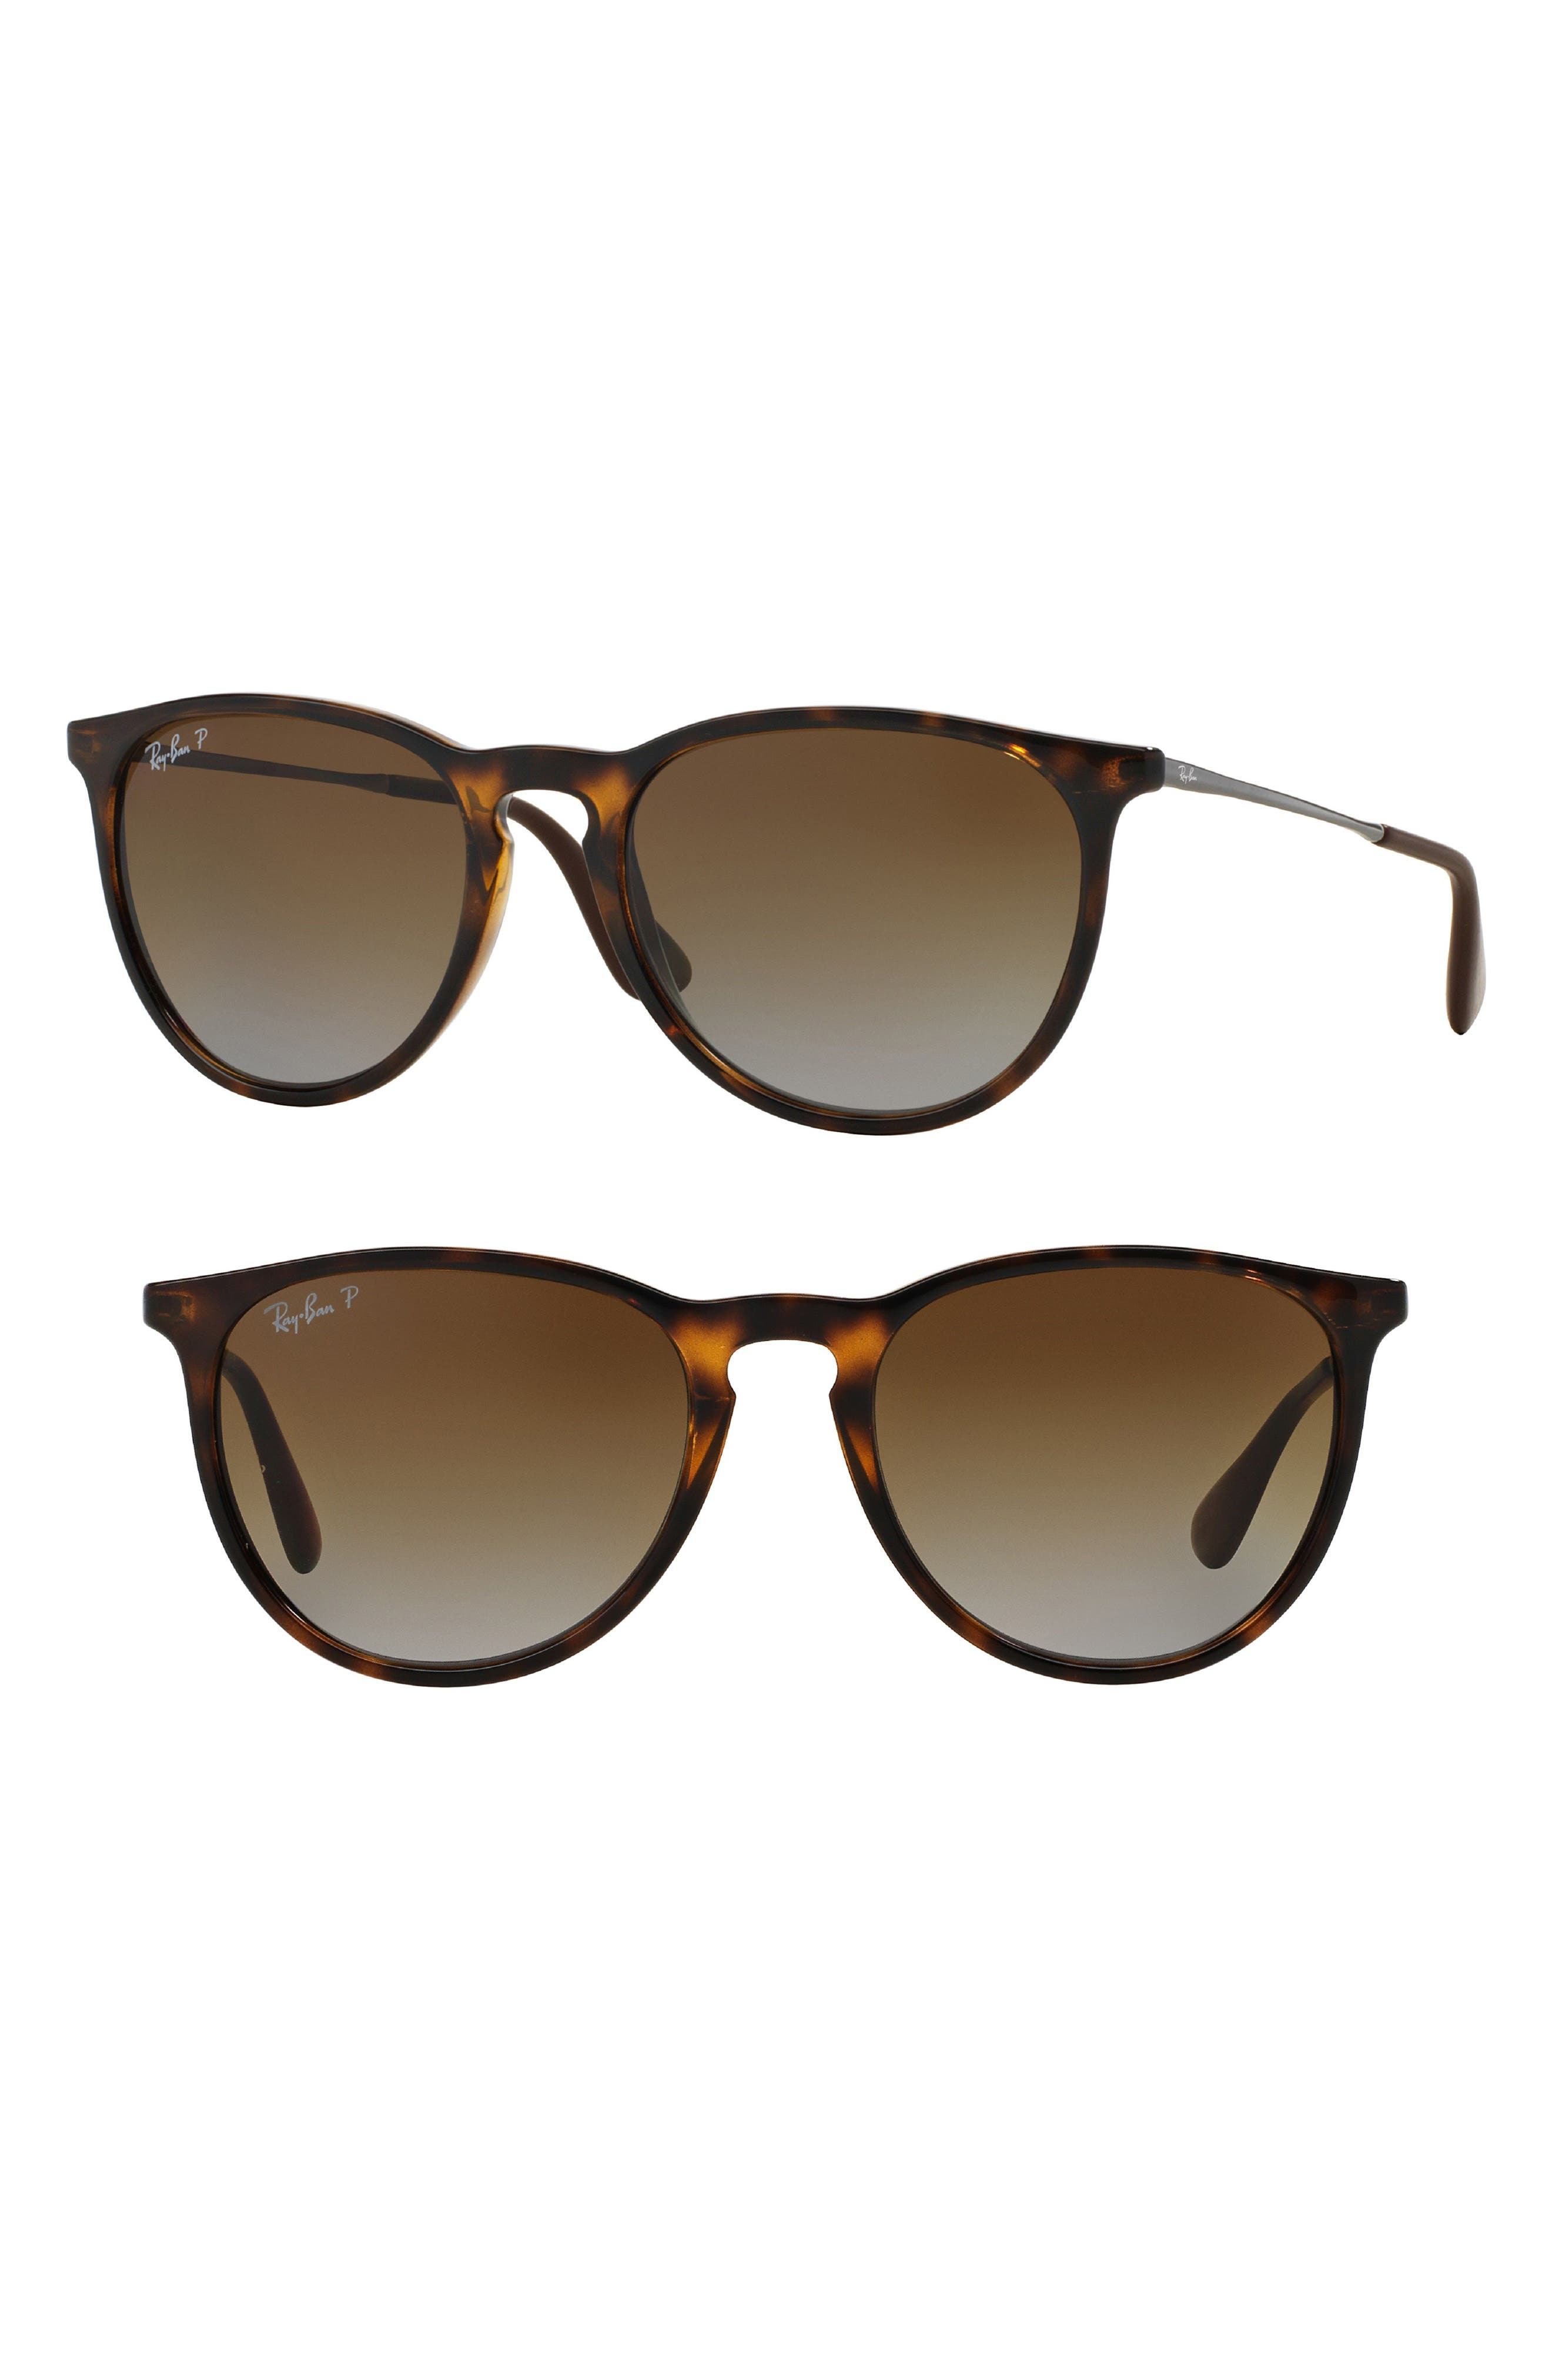 Erika Classic 54mm Sunglasses,                             Main thumbnail 1, color,                             HAVANA